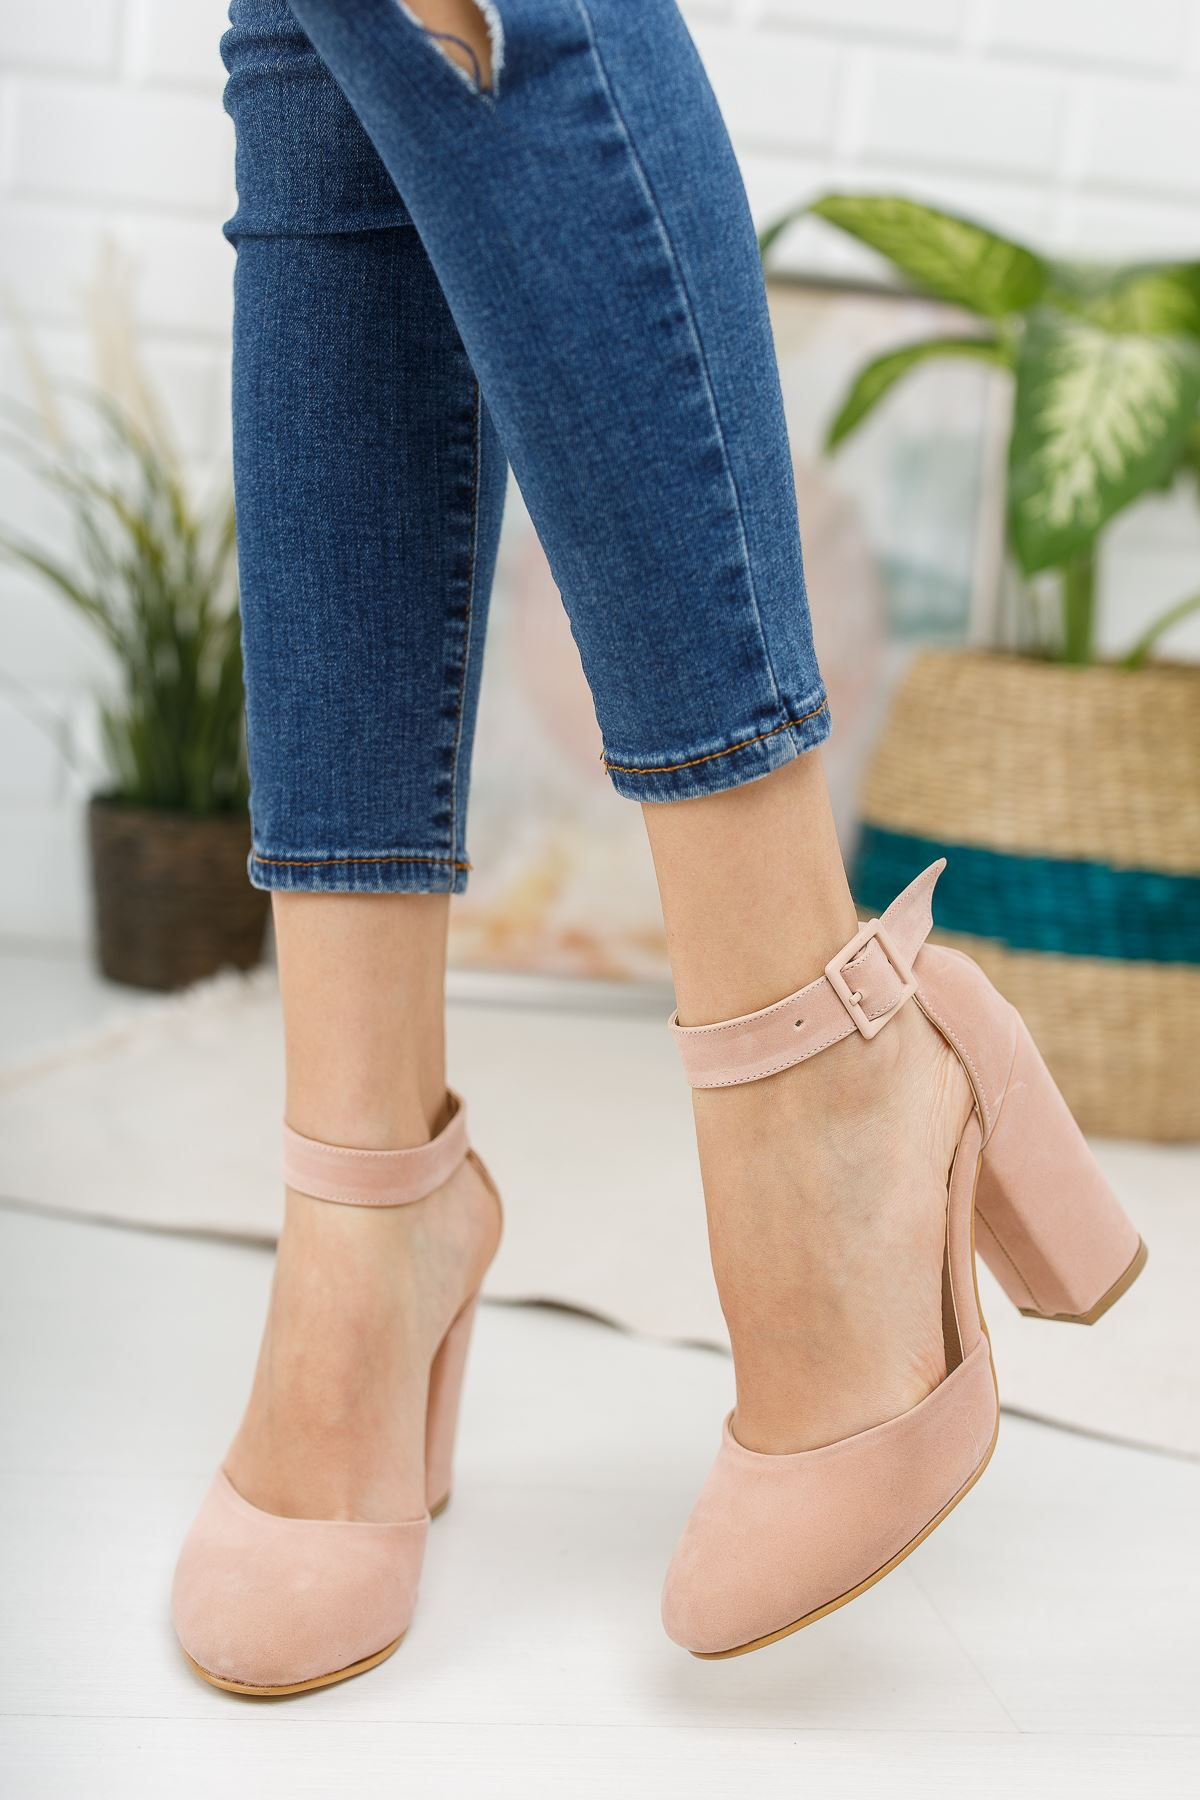 Kadın Berland Pudra Topuklu Ayakkabı